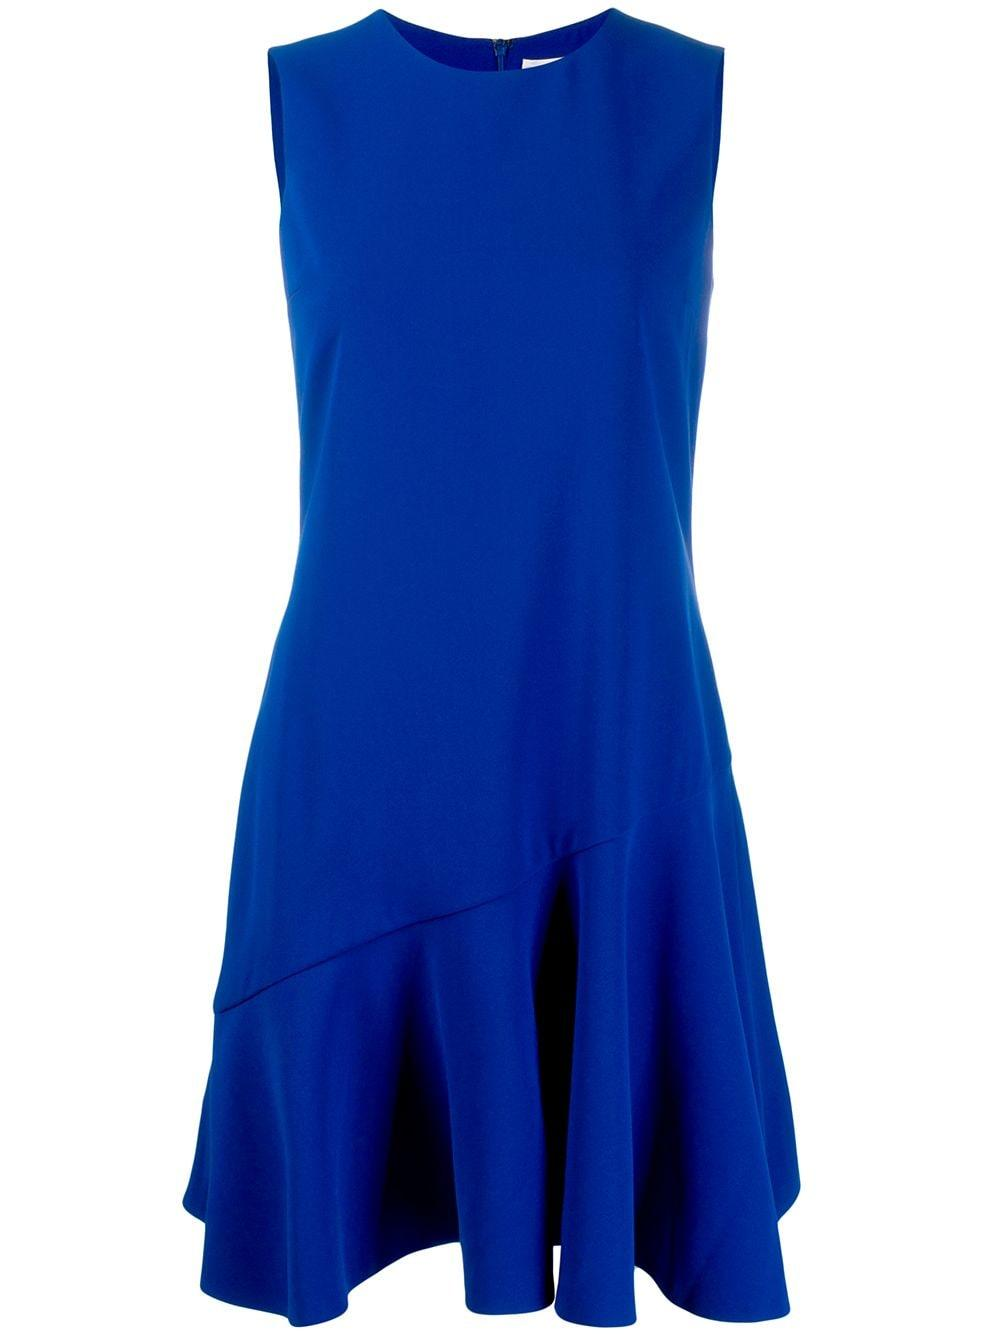 Sleeve Less Crepe Flounce Hem Shift Dress Item # 2419WDR000191A